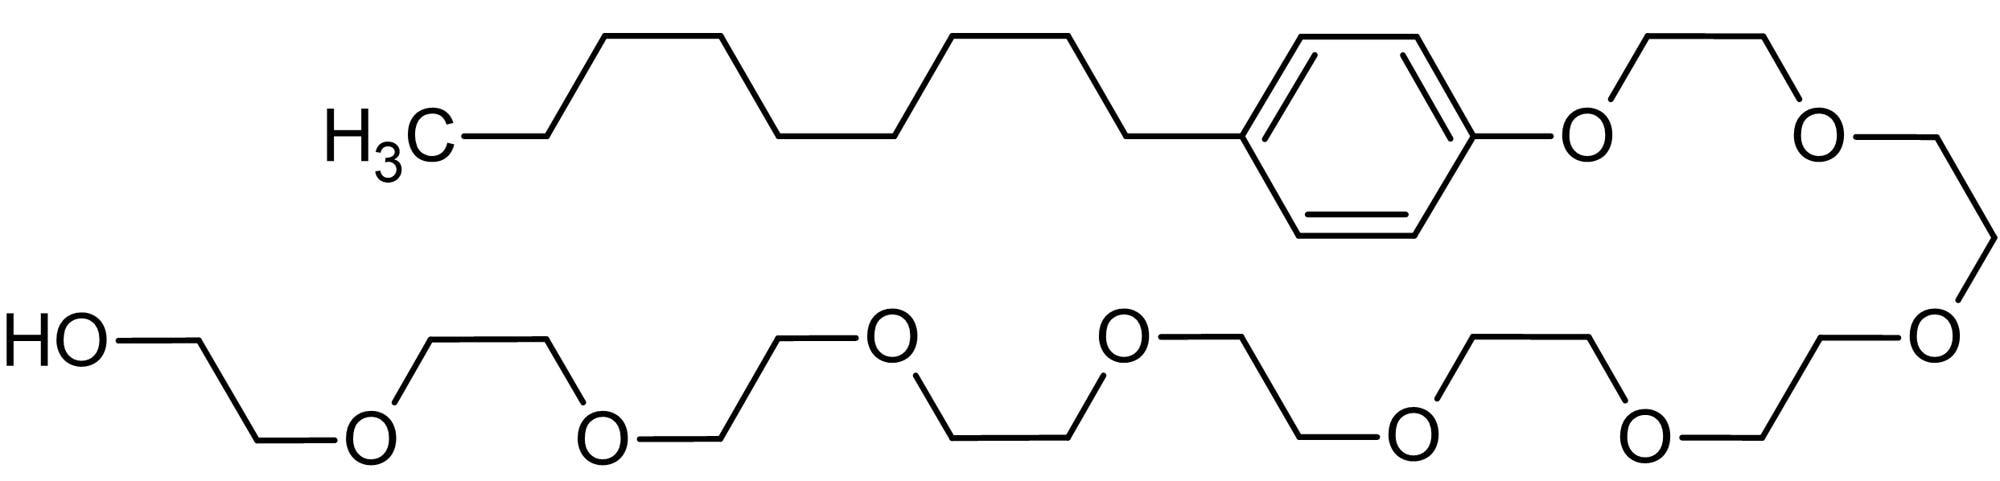 Chemical Structure - Nonoxynol-9 (N-9), Nonionic surfactant (ab143673)